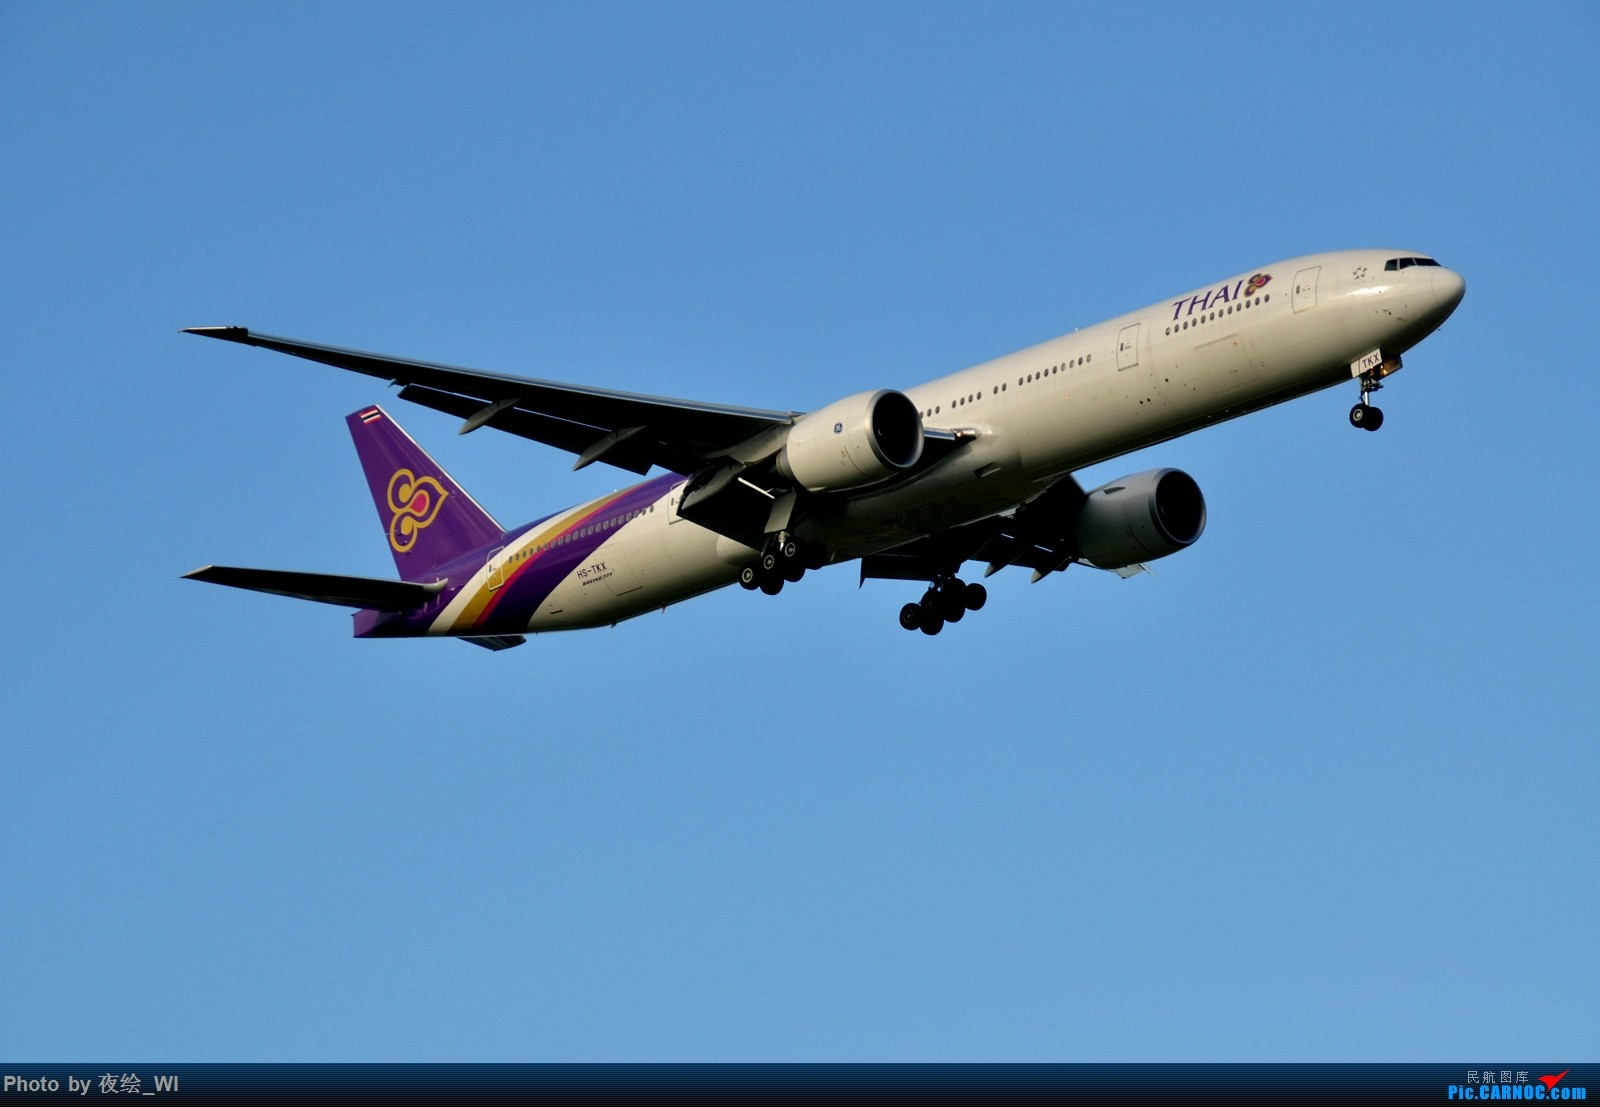 Re:[原创]【PVG】不只守着NKG,国庆疯狂拍机之浦东行,天空美得简直不像话! BOEING 777-300ER HS-TKX 中国上海浦东国际机场